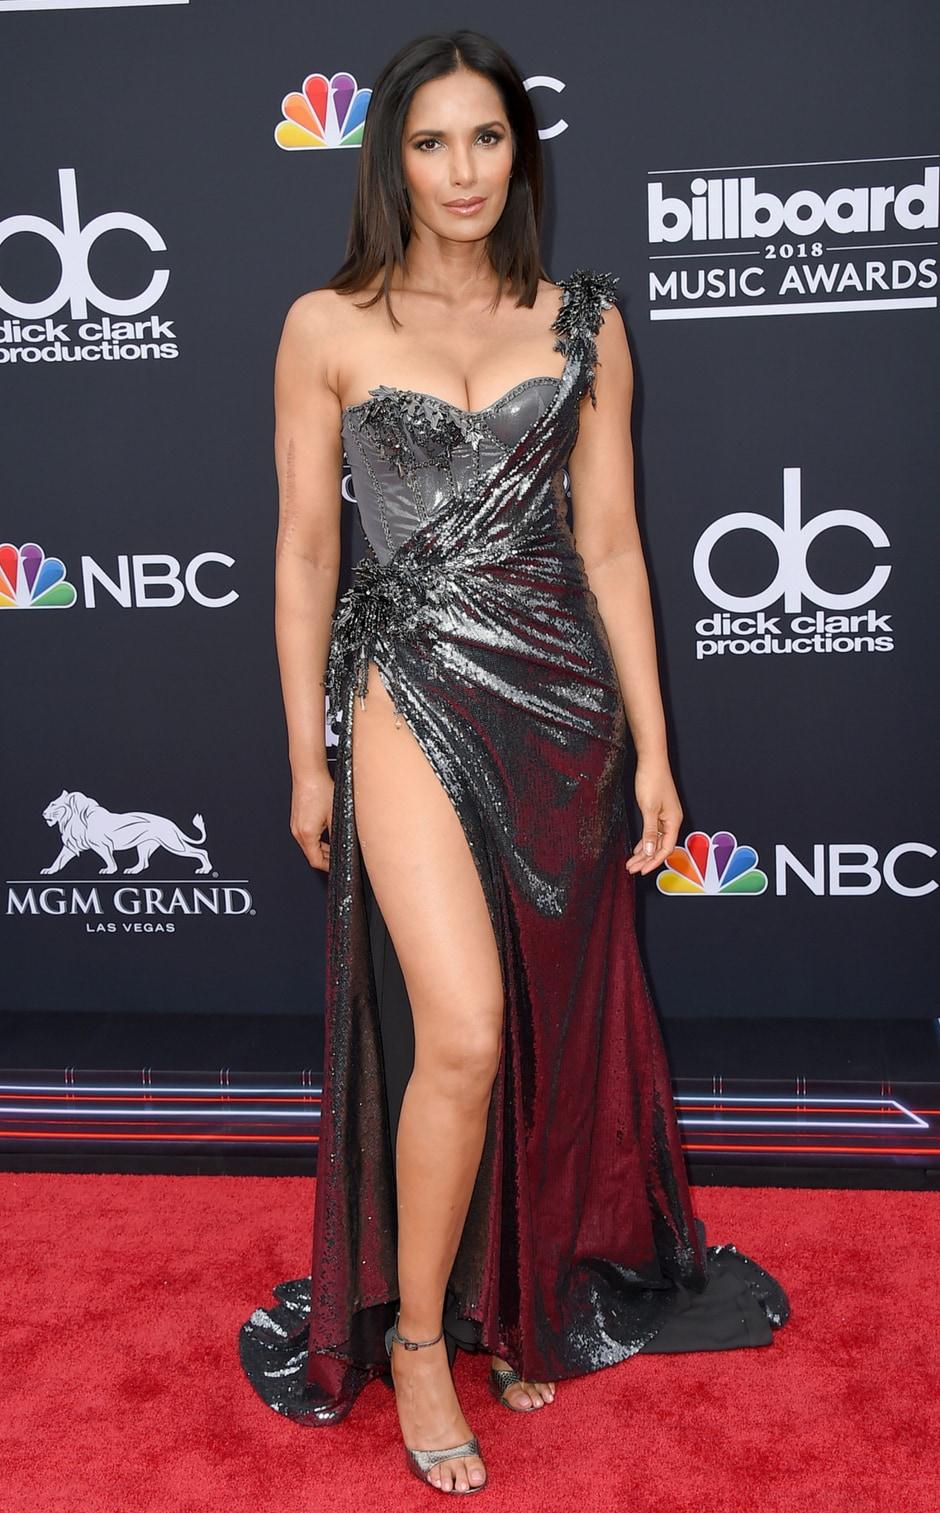 Padma Lakshmi at the Billboard Music Awards/Photo by Jordan Strauss/Invision/AP